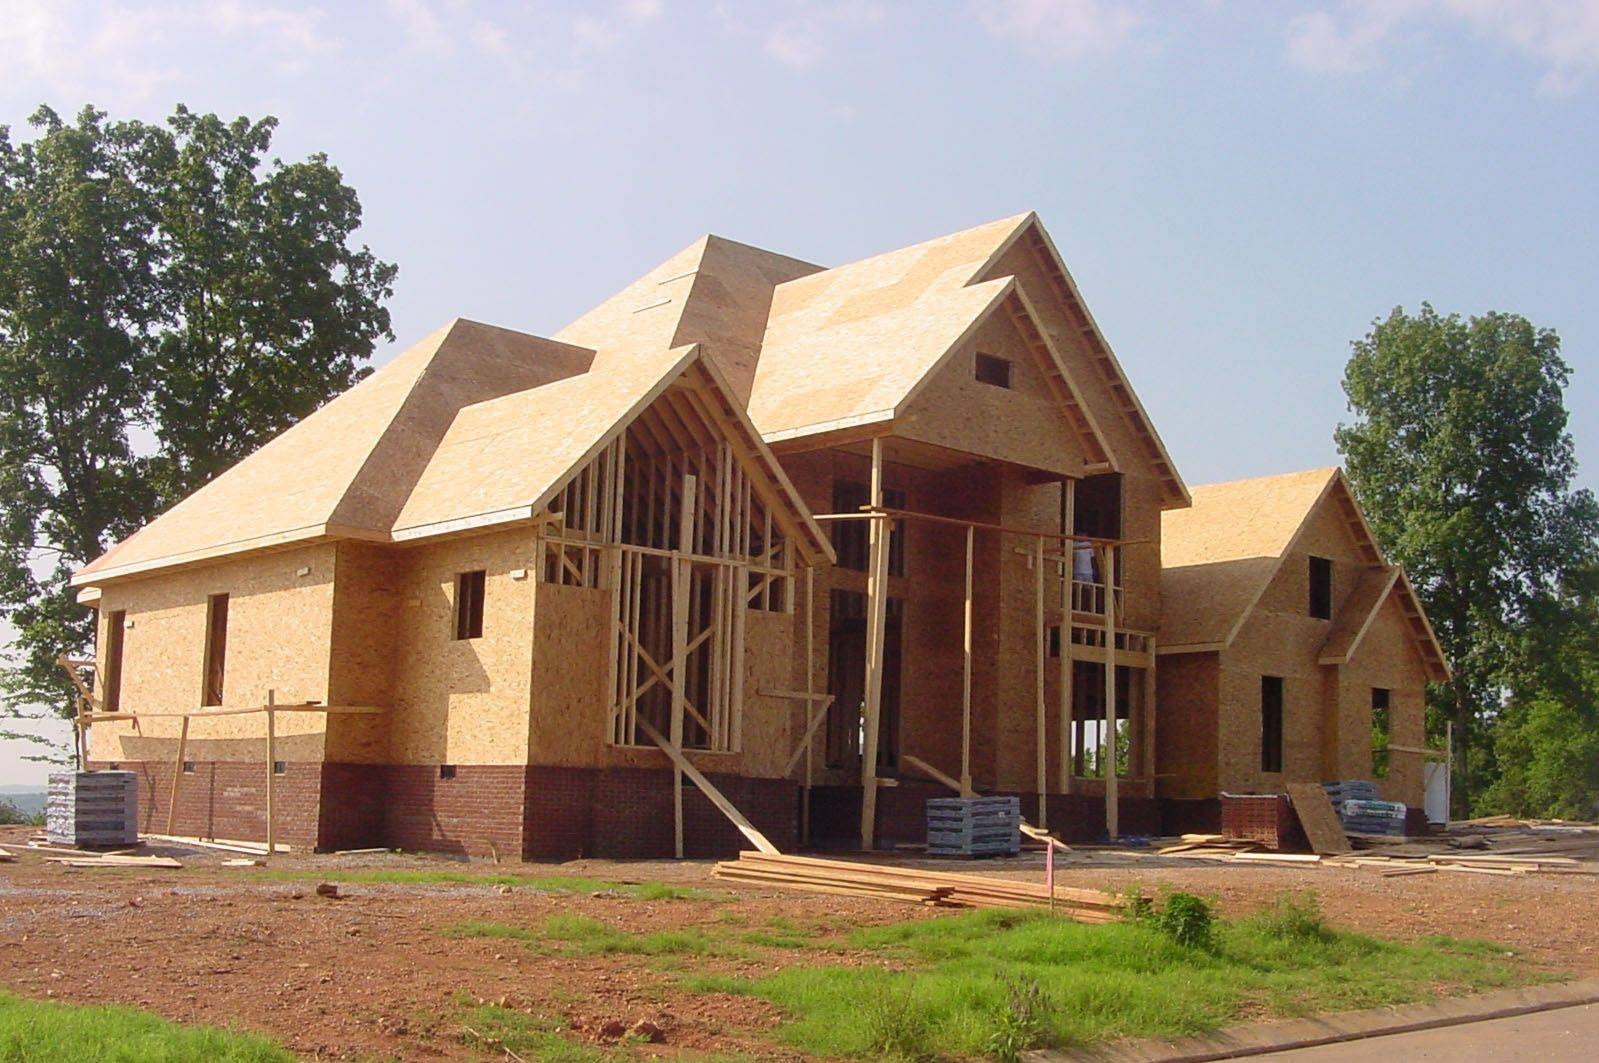 Pleasant 21 Perfect Images House Building House Plans 45271 Largest Home Design Picture Inspirations Pitcheantrous